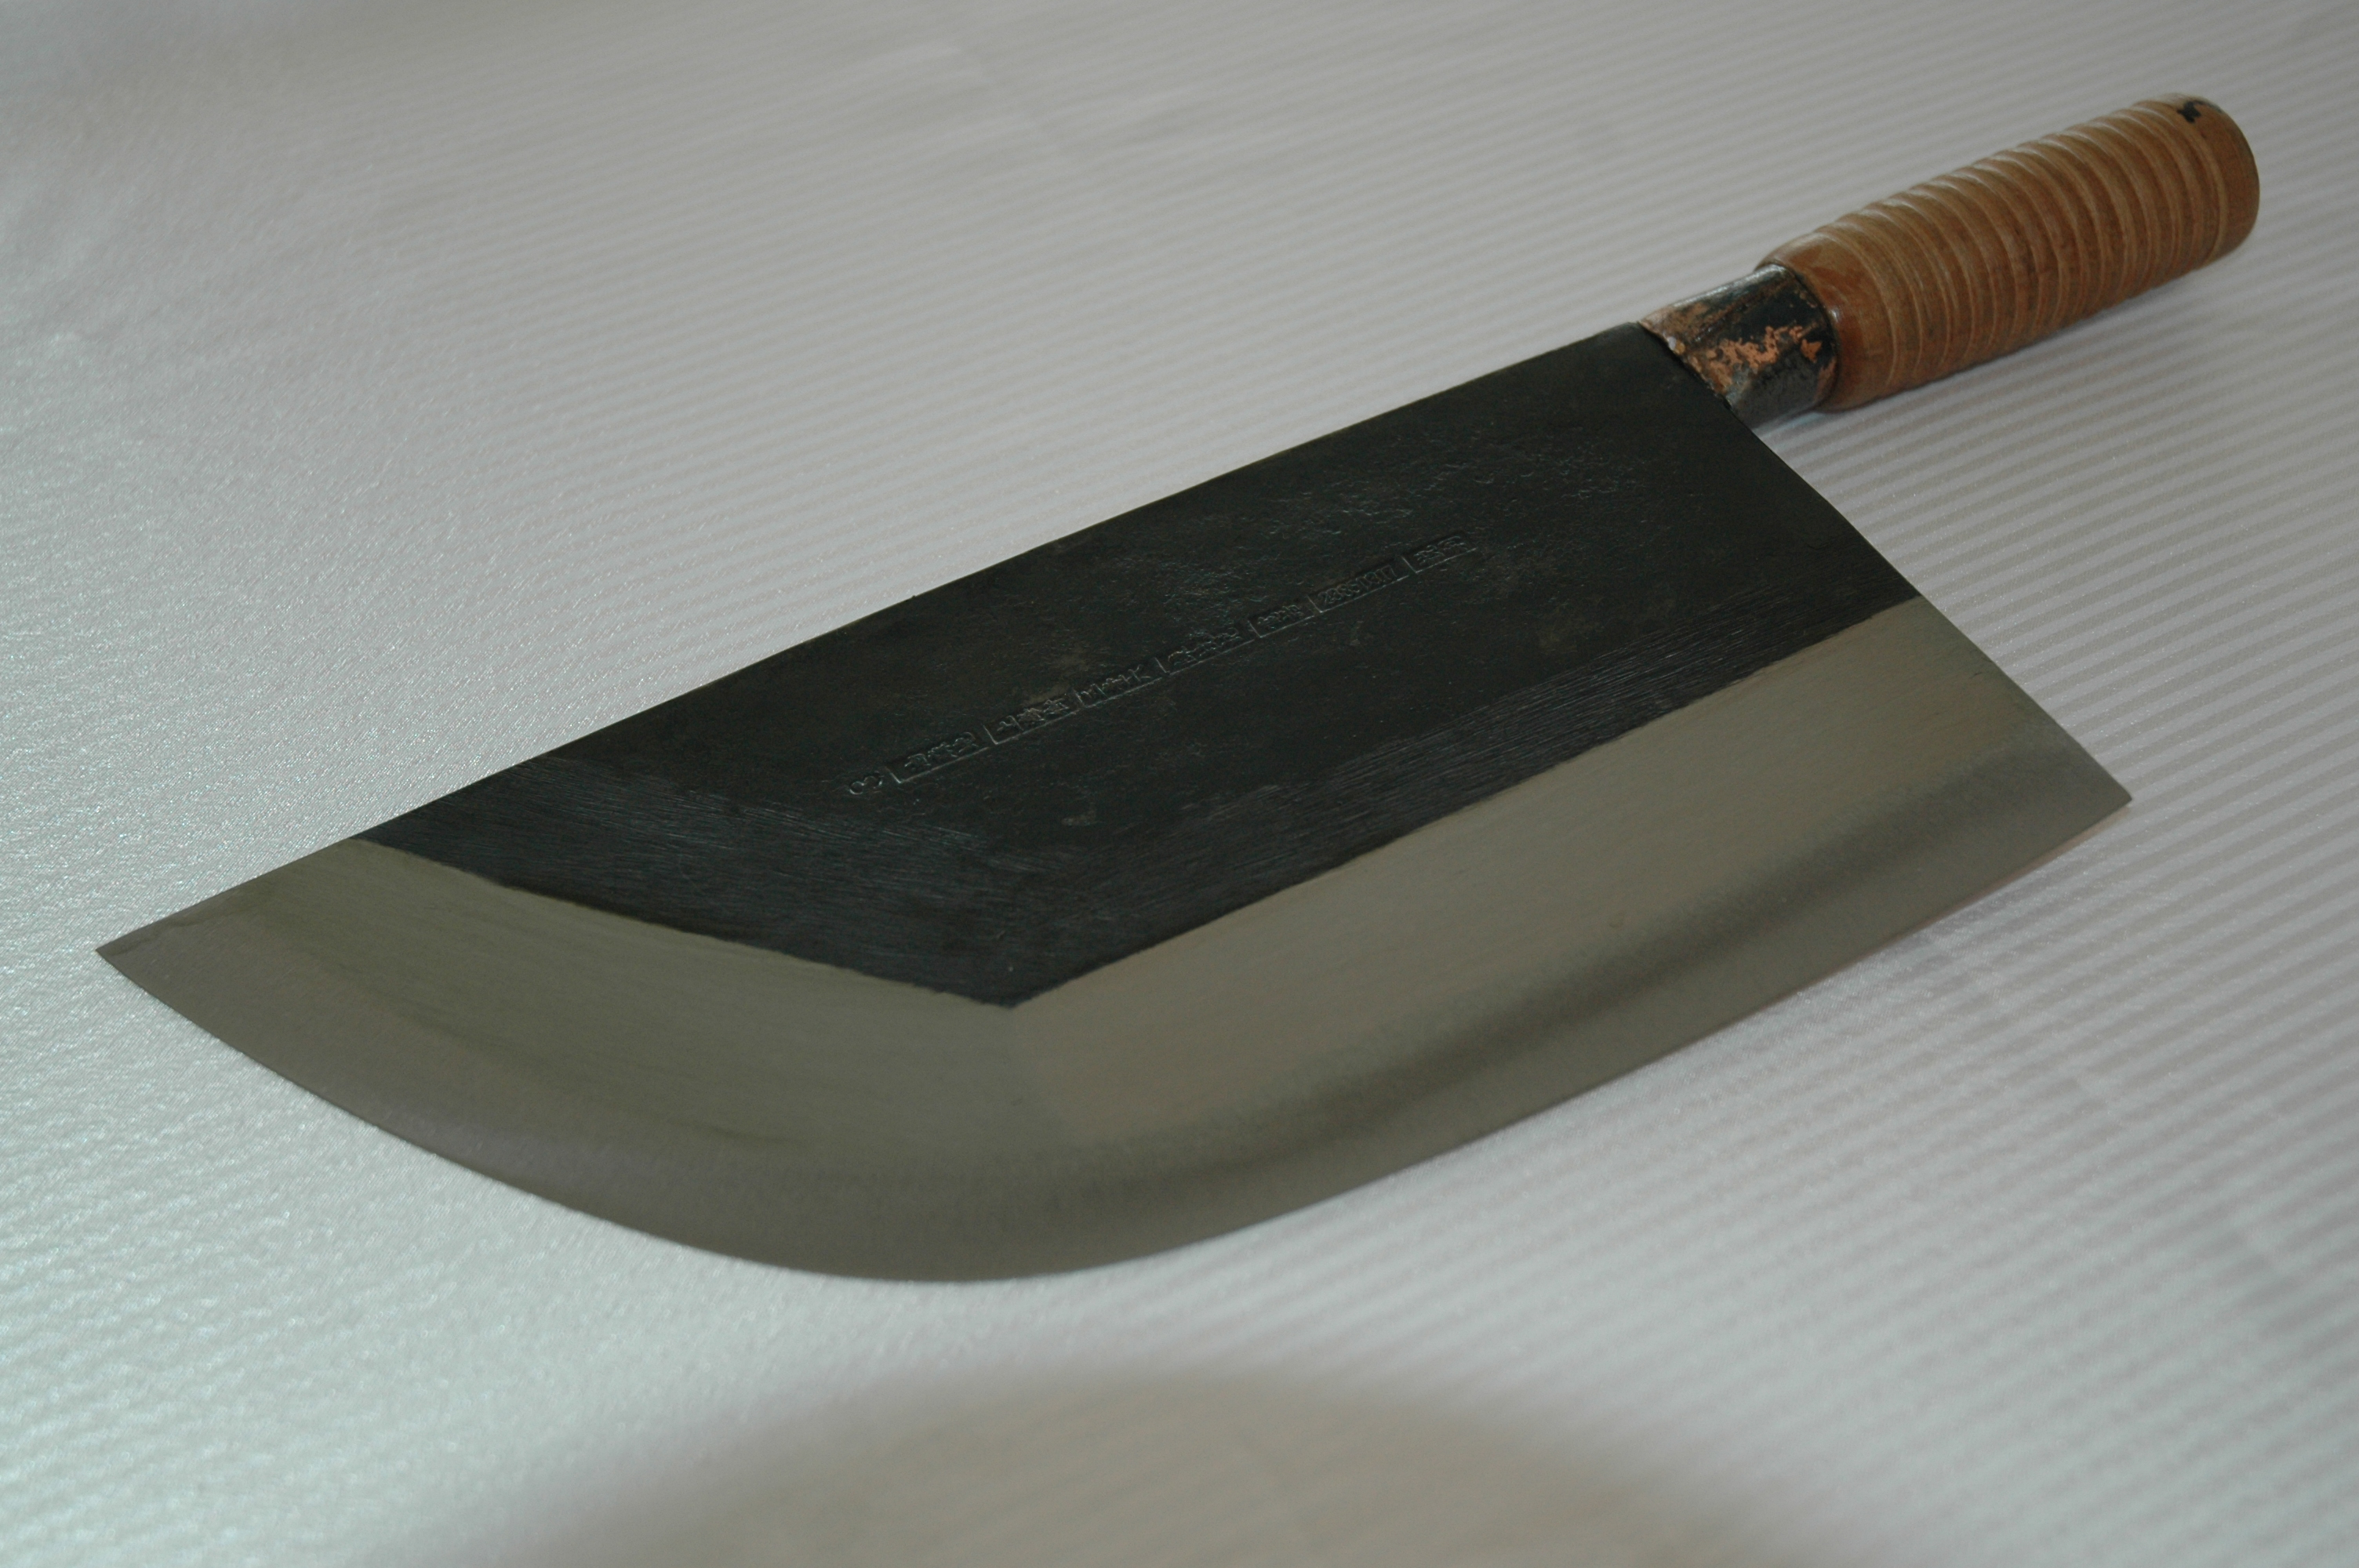 Kf2203 Heavy Duty Butcher S Knife Petekitchenware S Blog